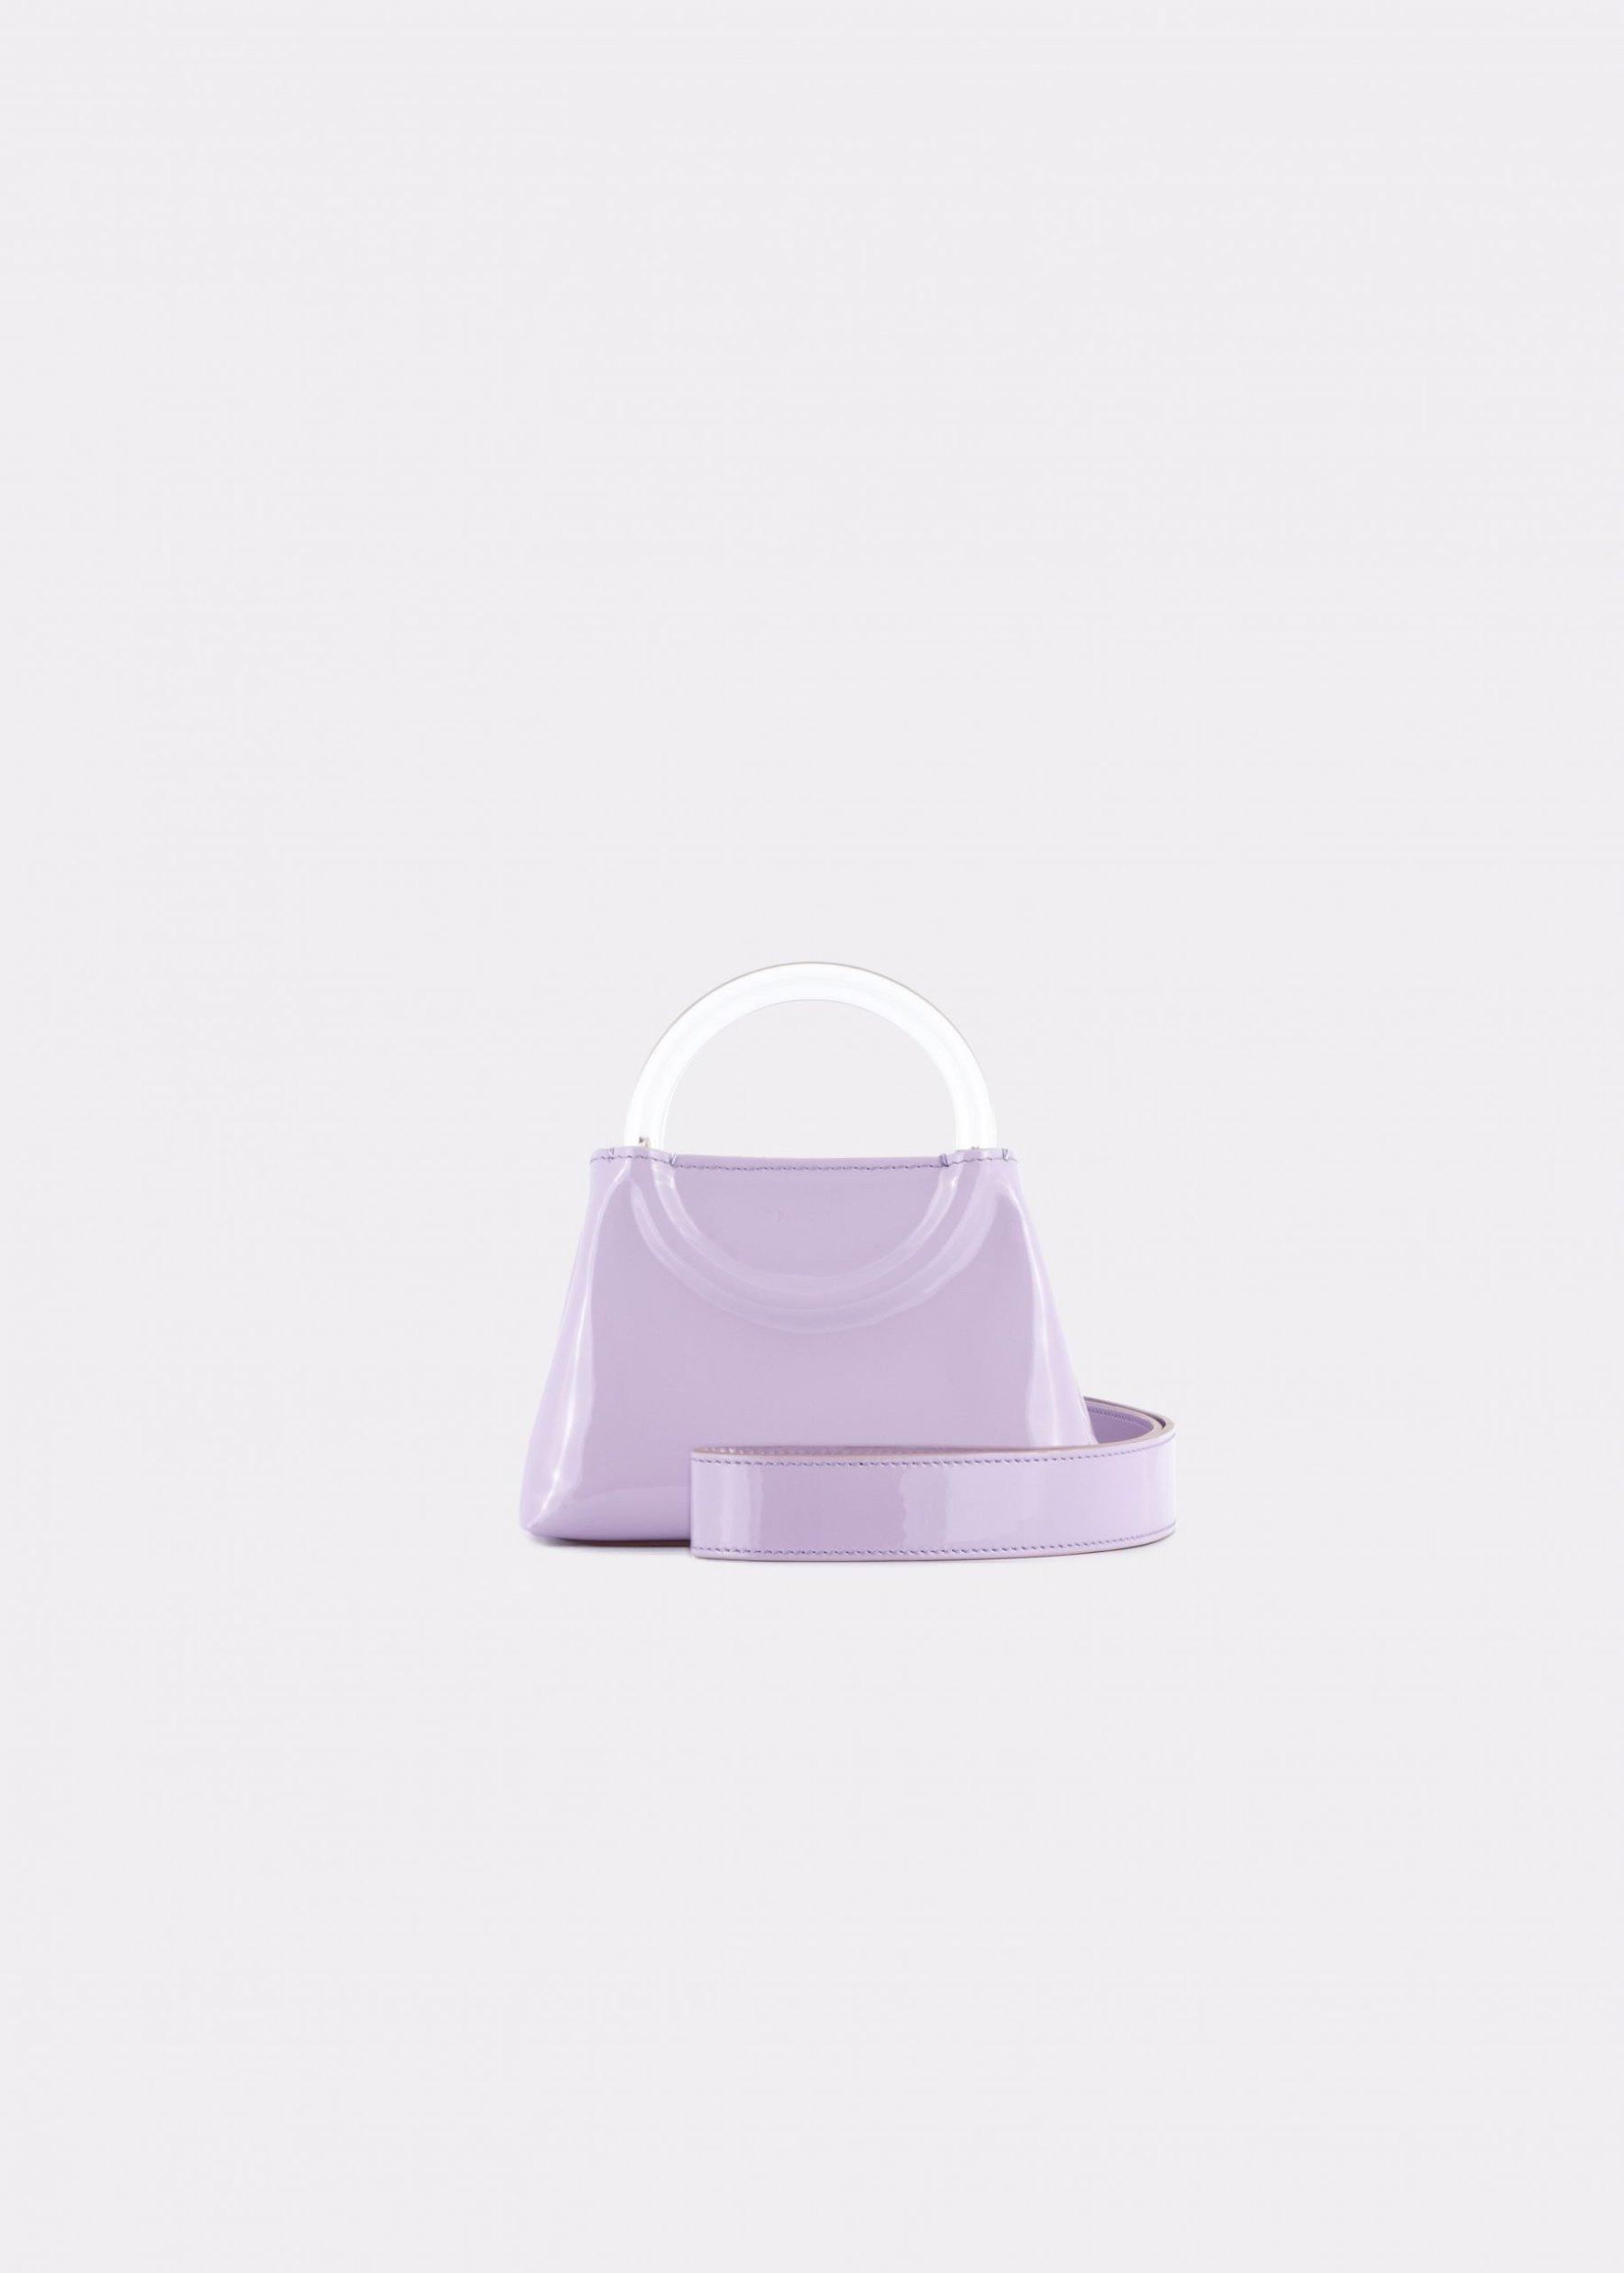 NIDO Bolla Micro bag liliac patent leather Plexy_shoulder strap view